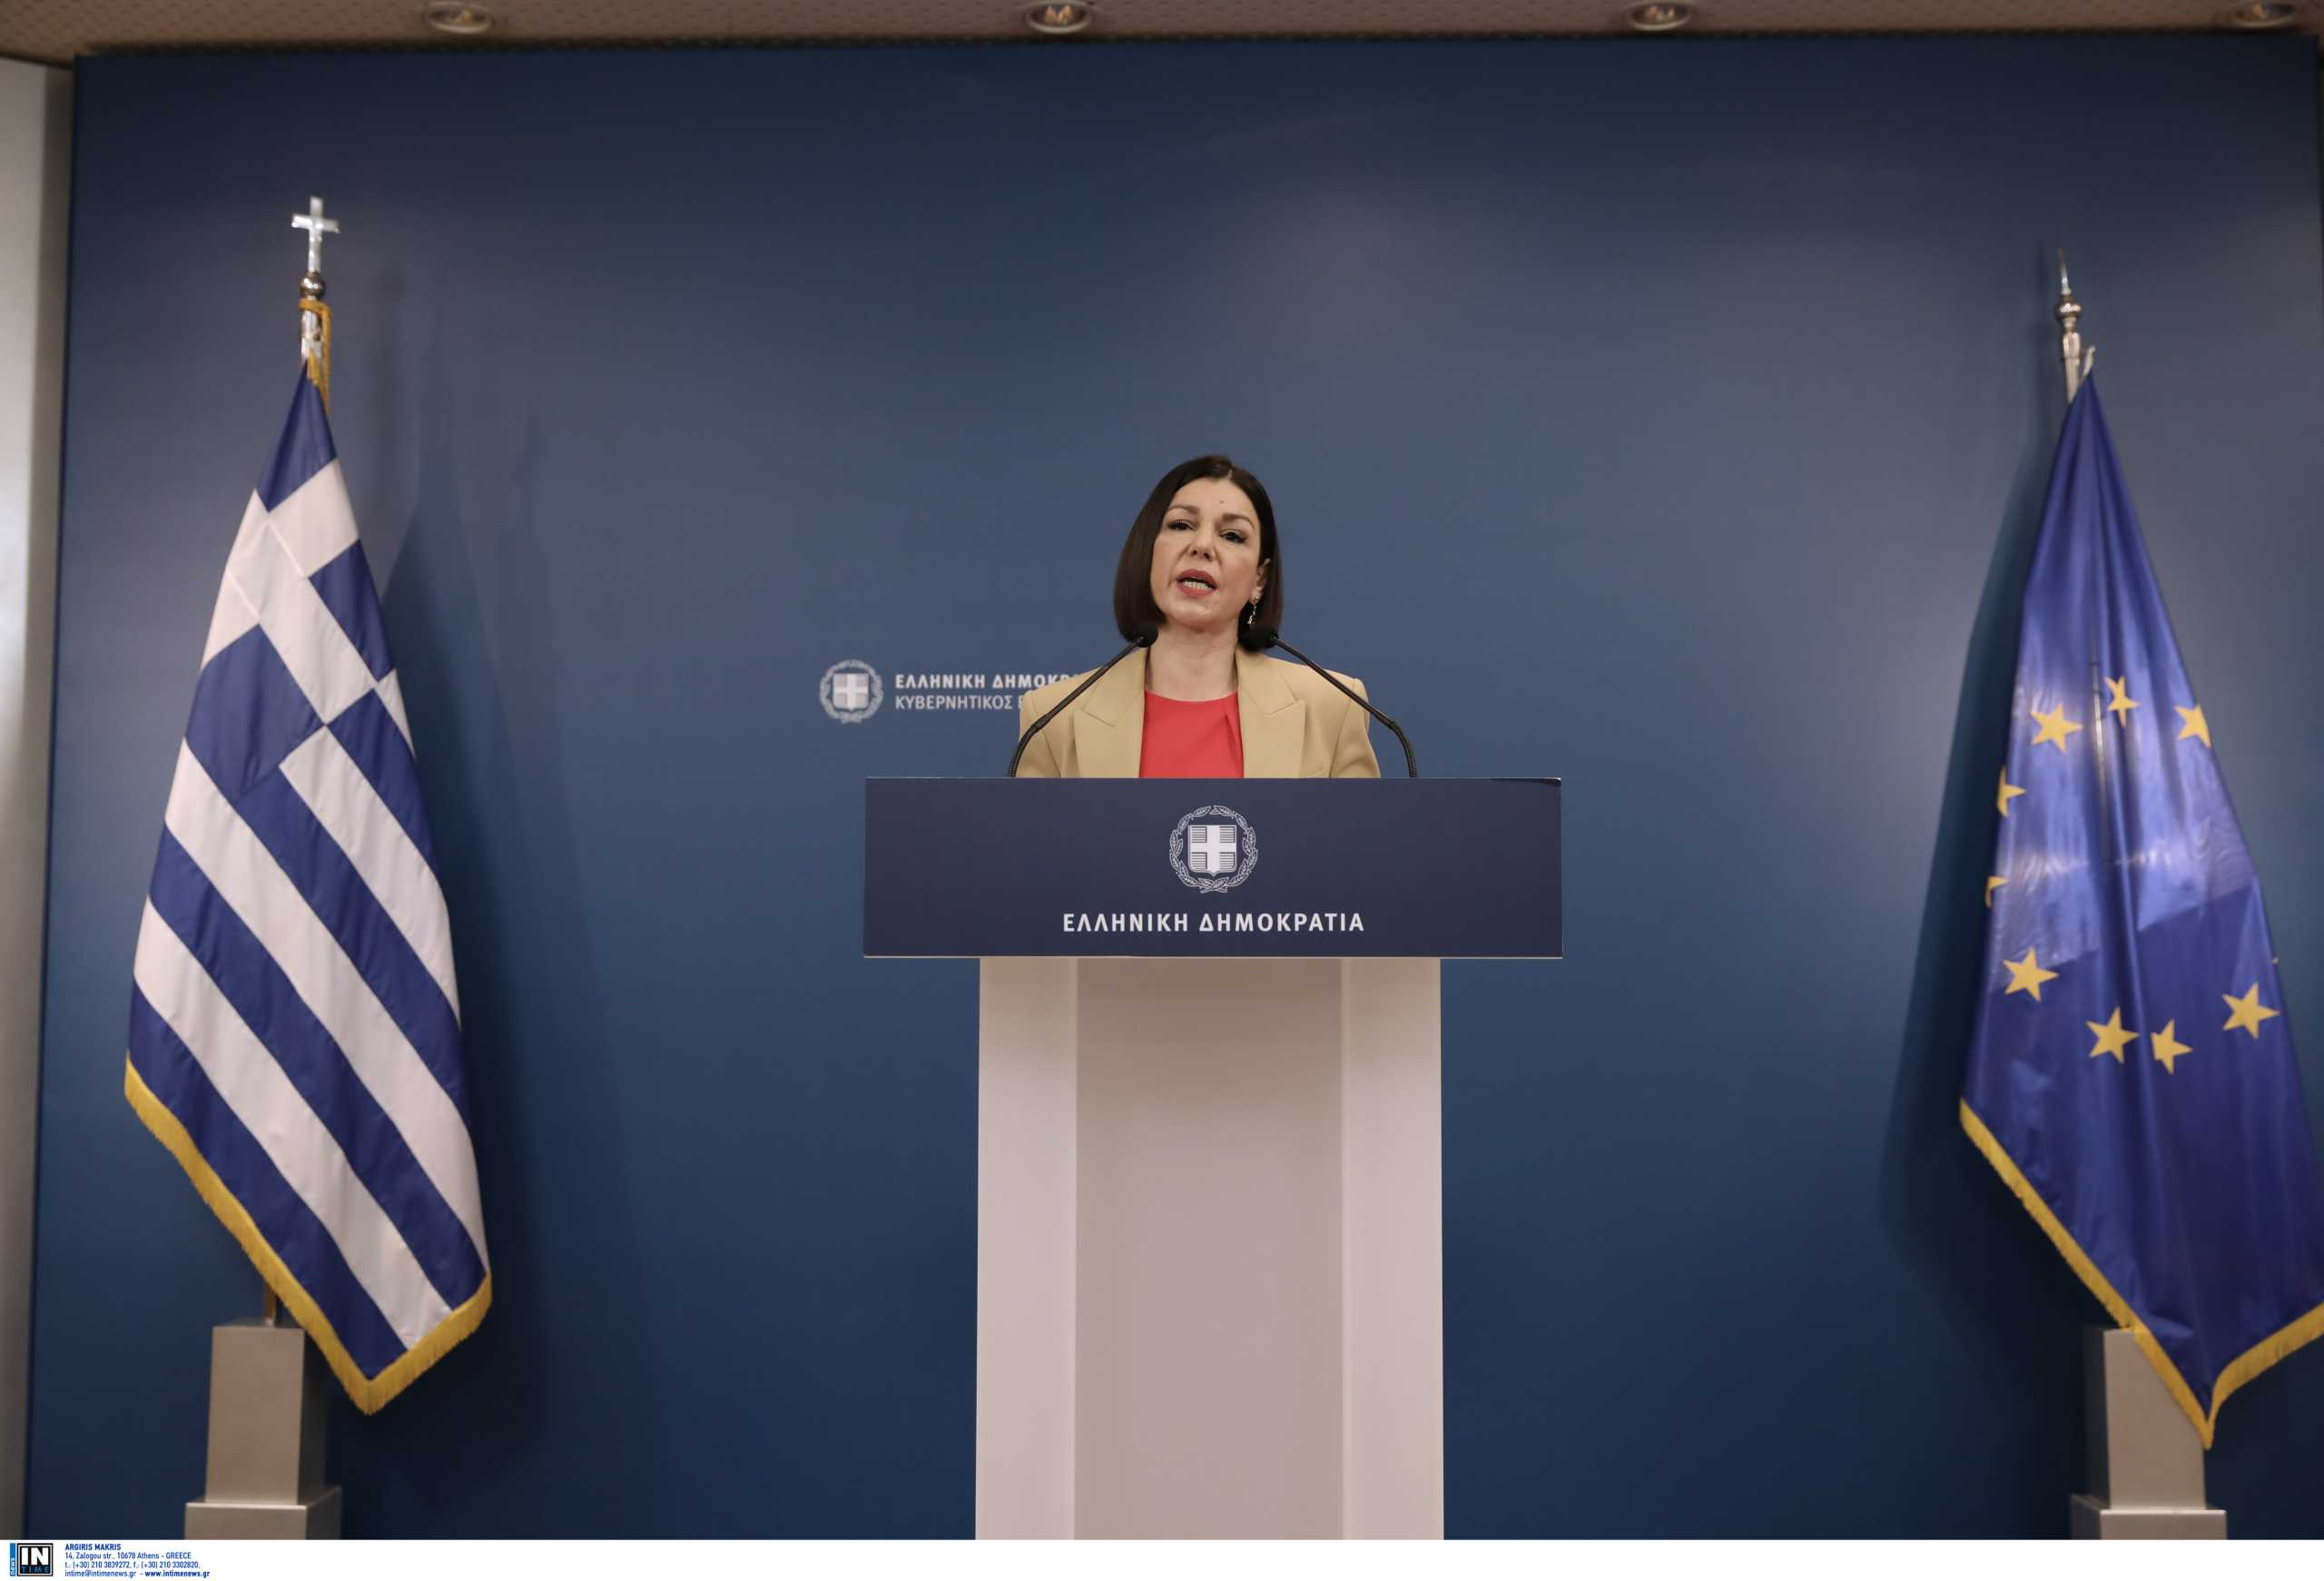 Live: Η ενημέρωση από την κυβερνητική εκπρόσωπο Αριστοτελία Πελώνη